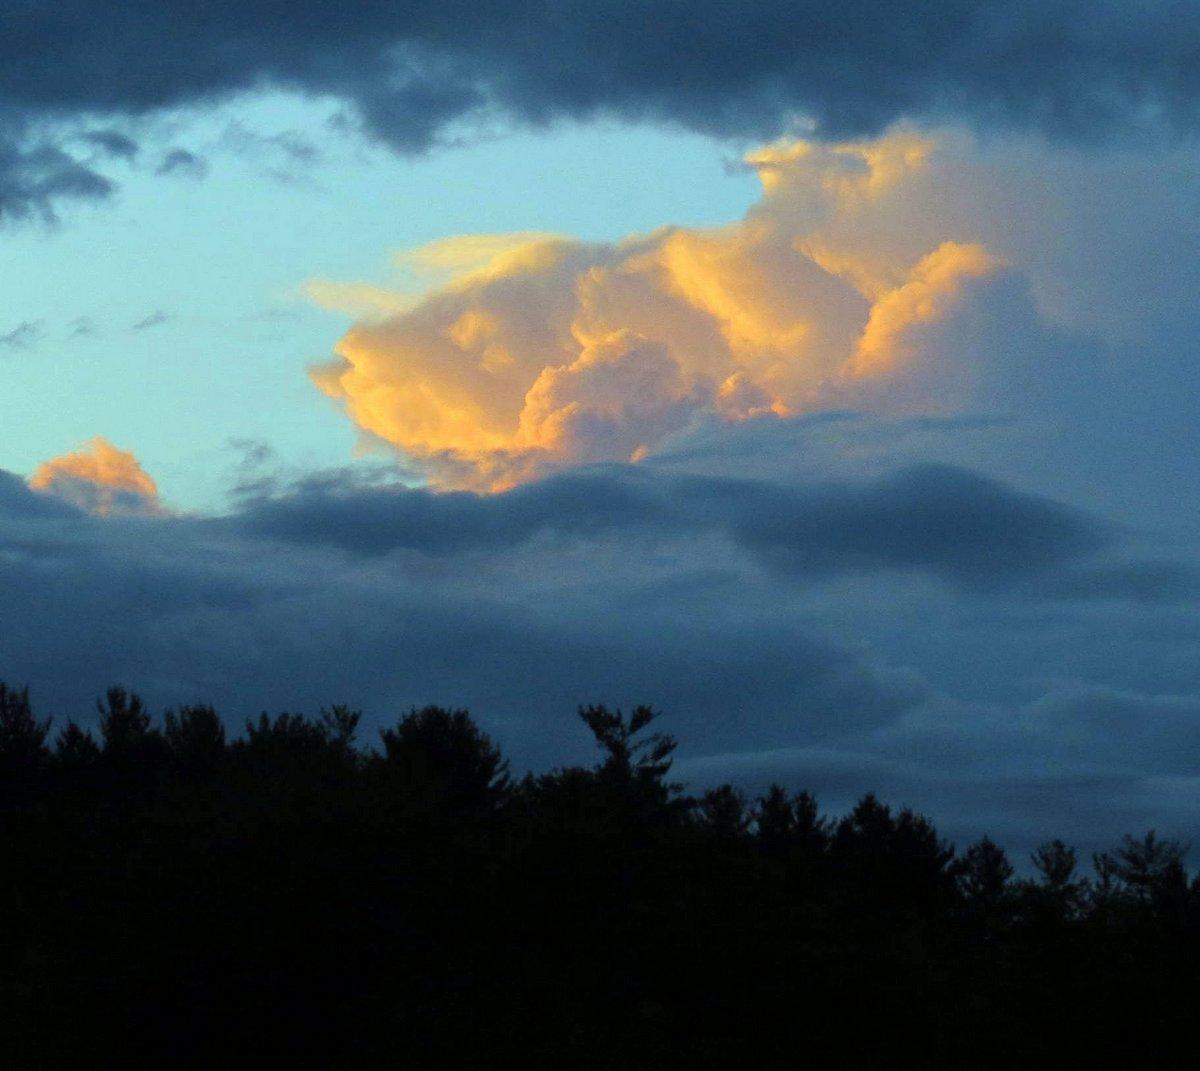 12. Sunlit Clouds